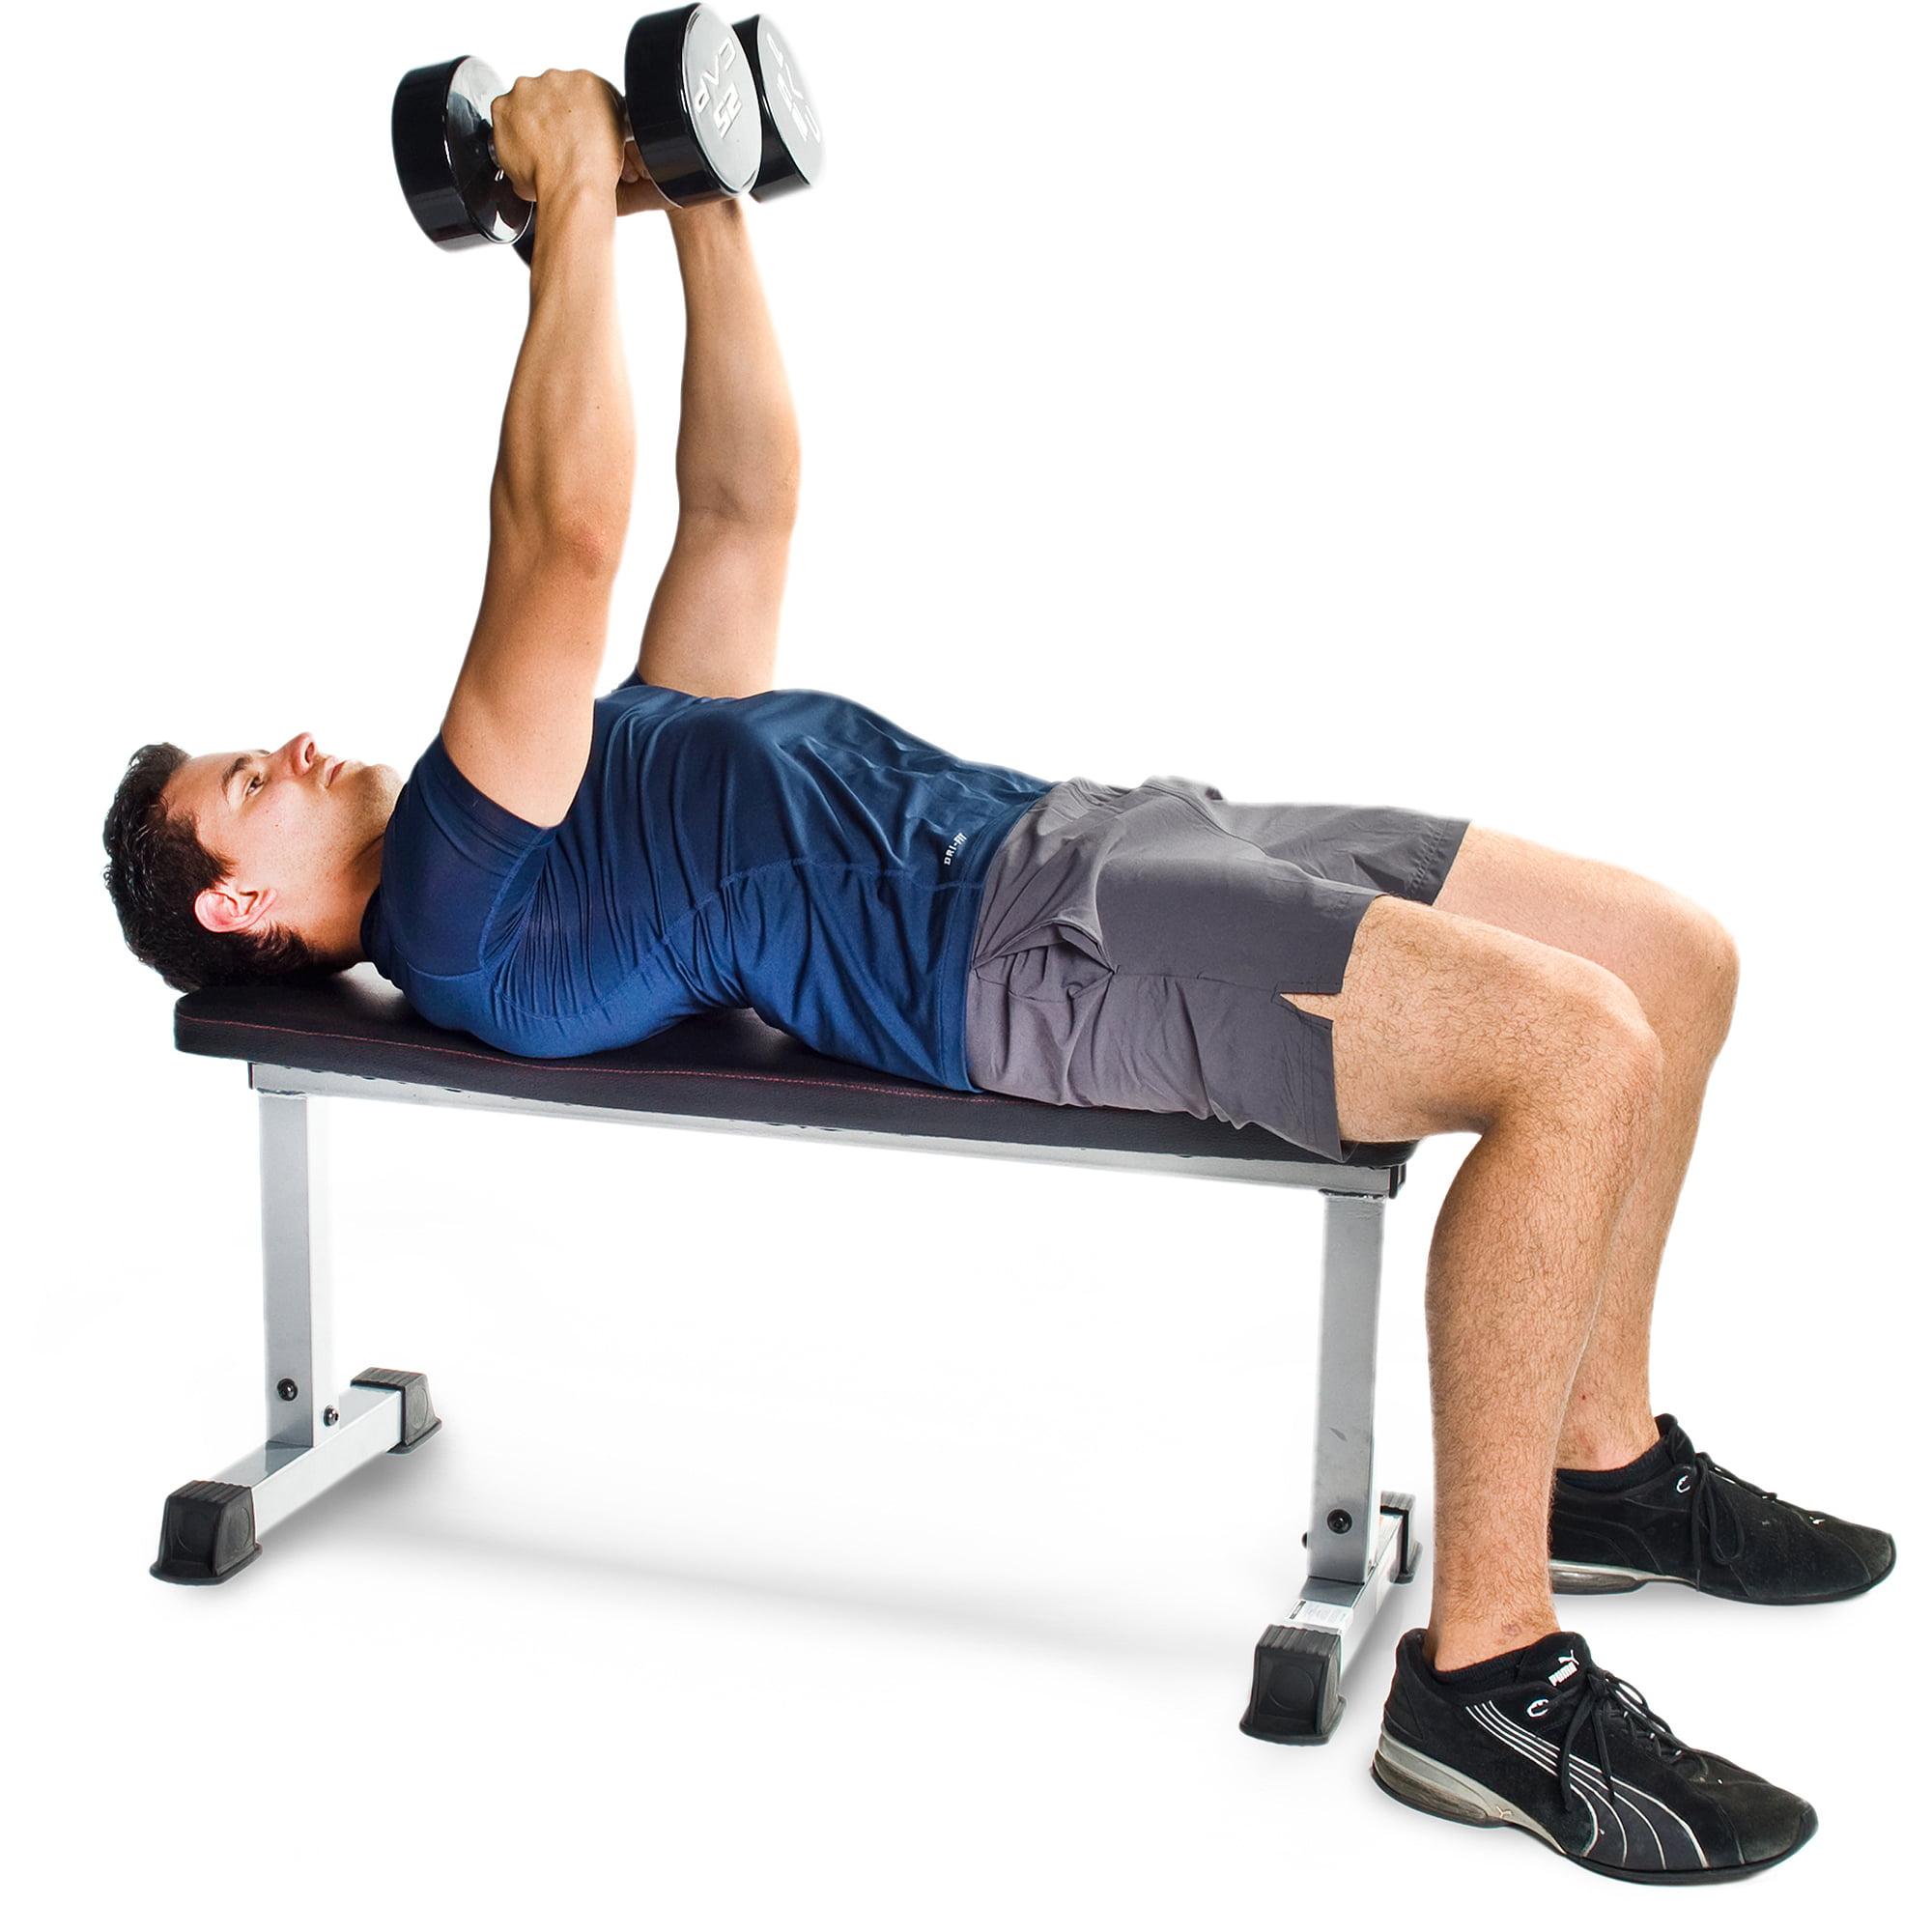 Surprising Cap Strength Flat Weight Bench Walmart Com Andrewgaddart Wooden Chair Designs For Living Room Andrewgaddartcom